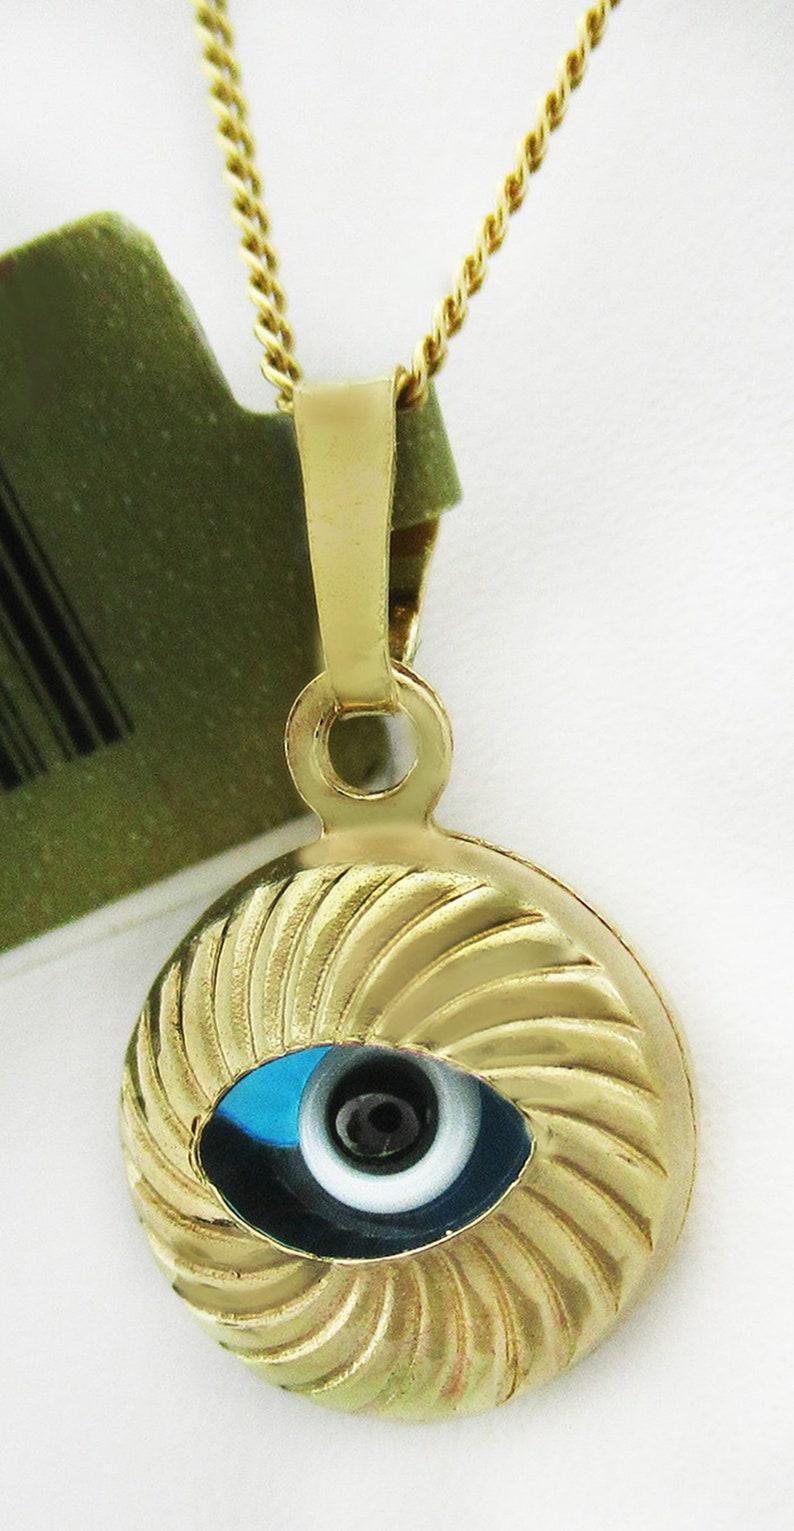 Evil Eye Pendant Necklace Yellow Gold 14K